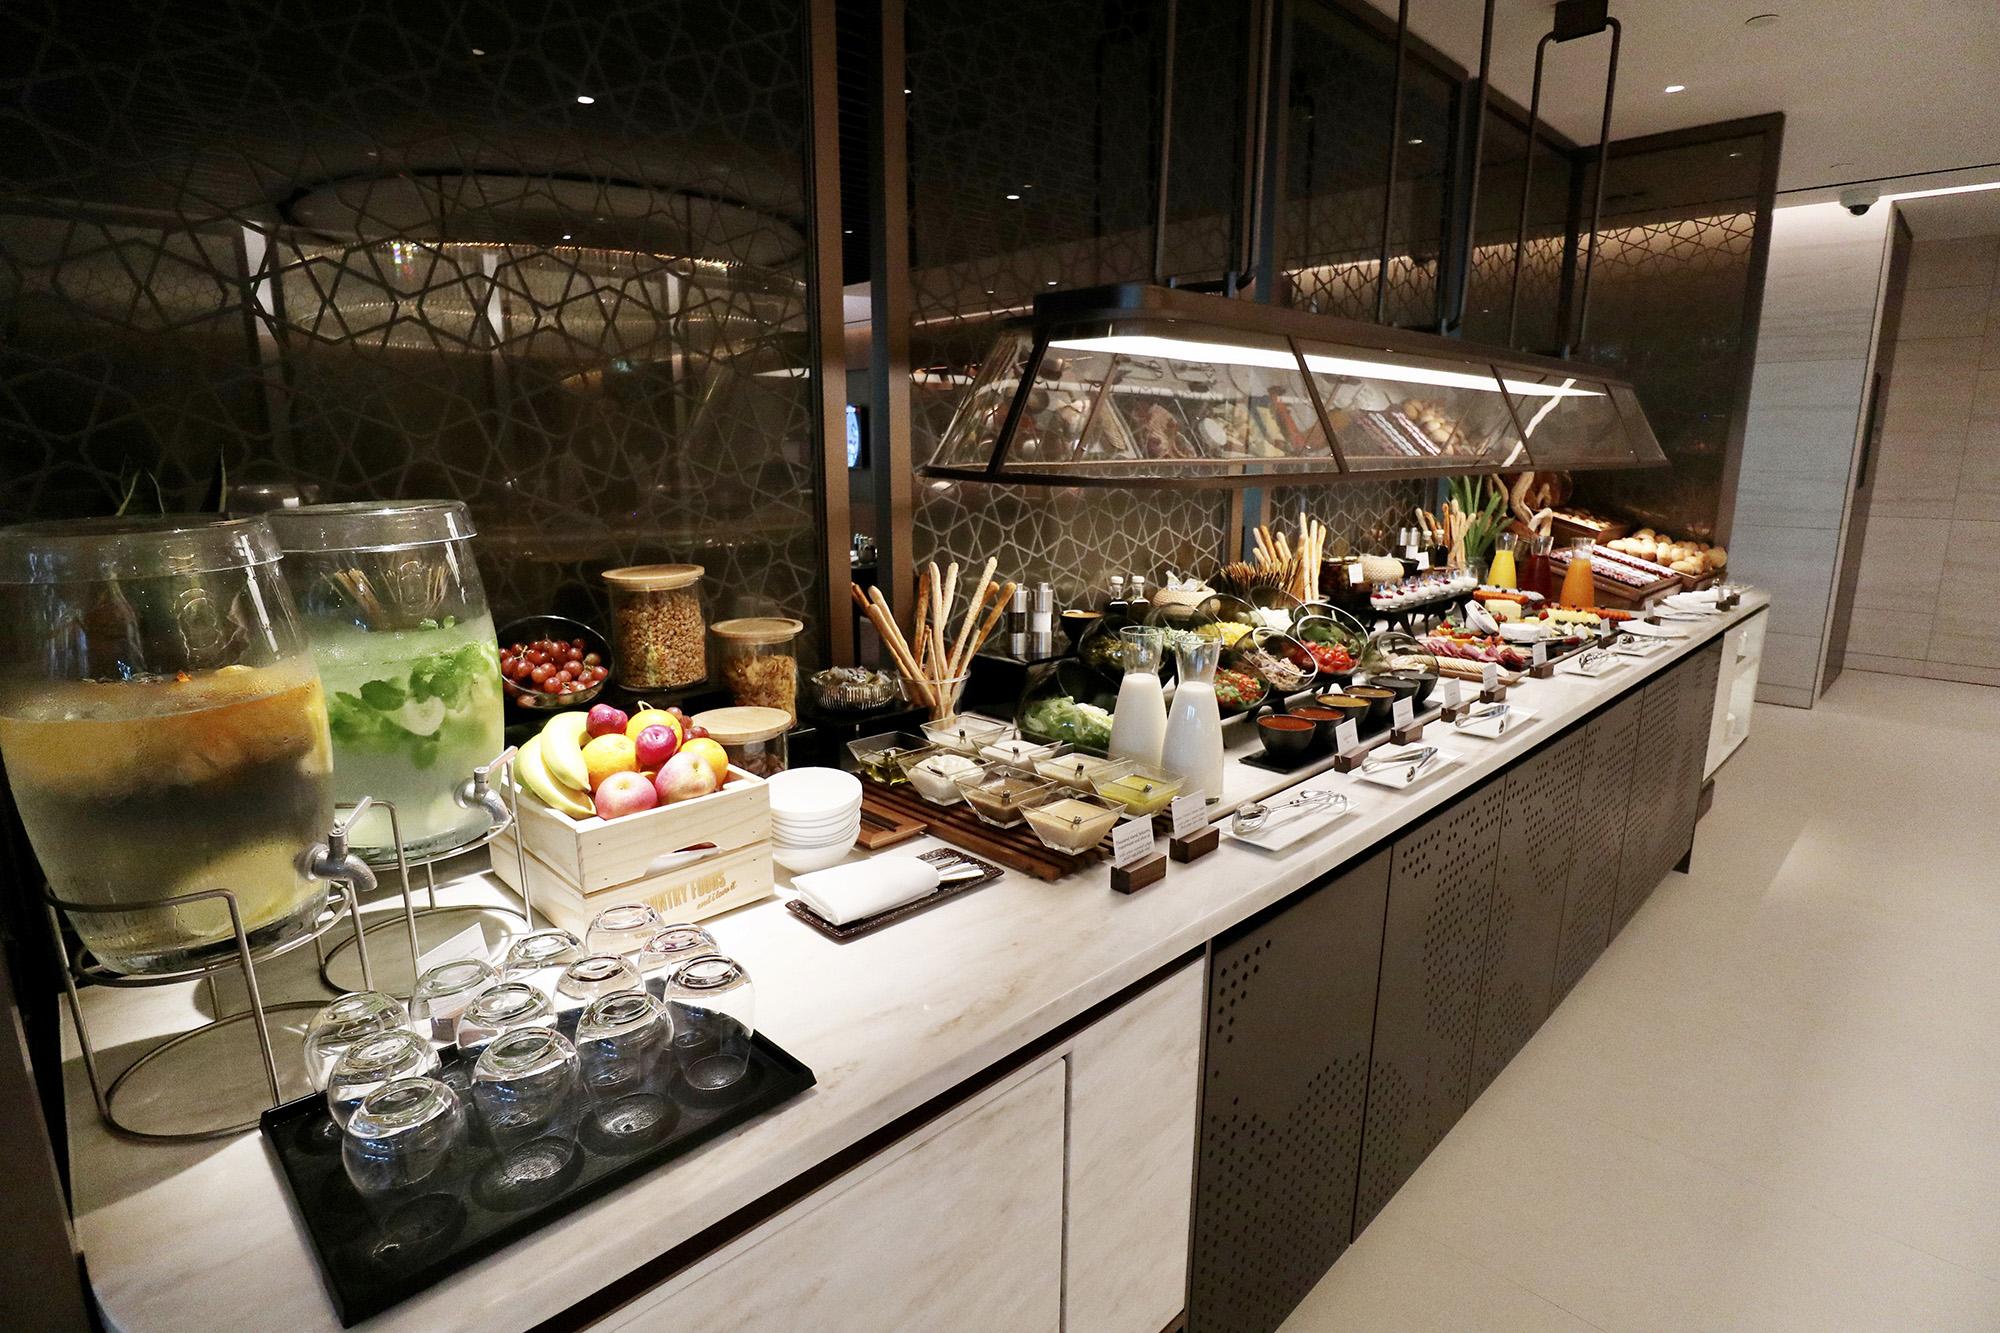 Salad Bar Overview